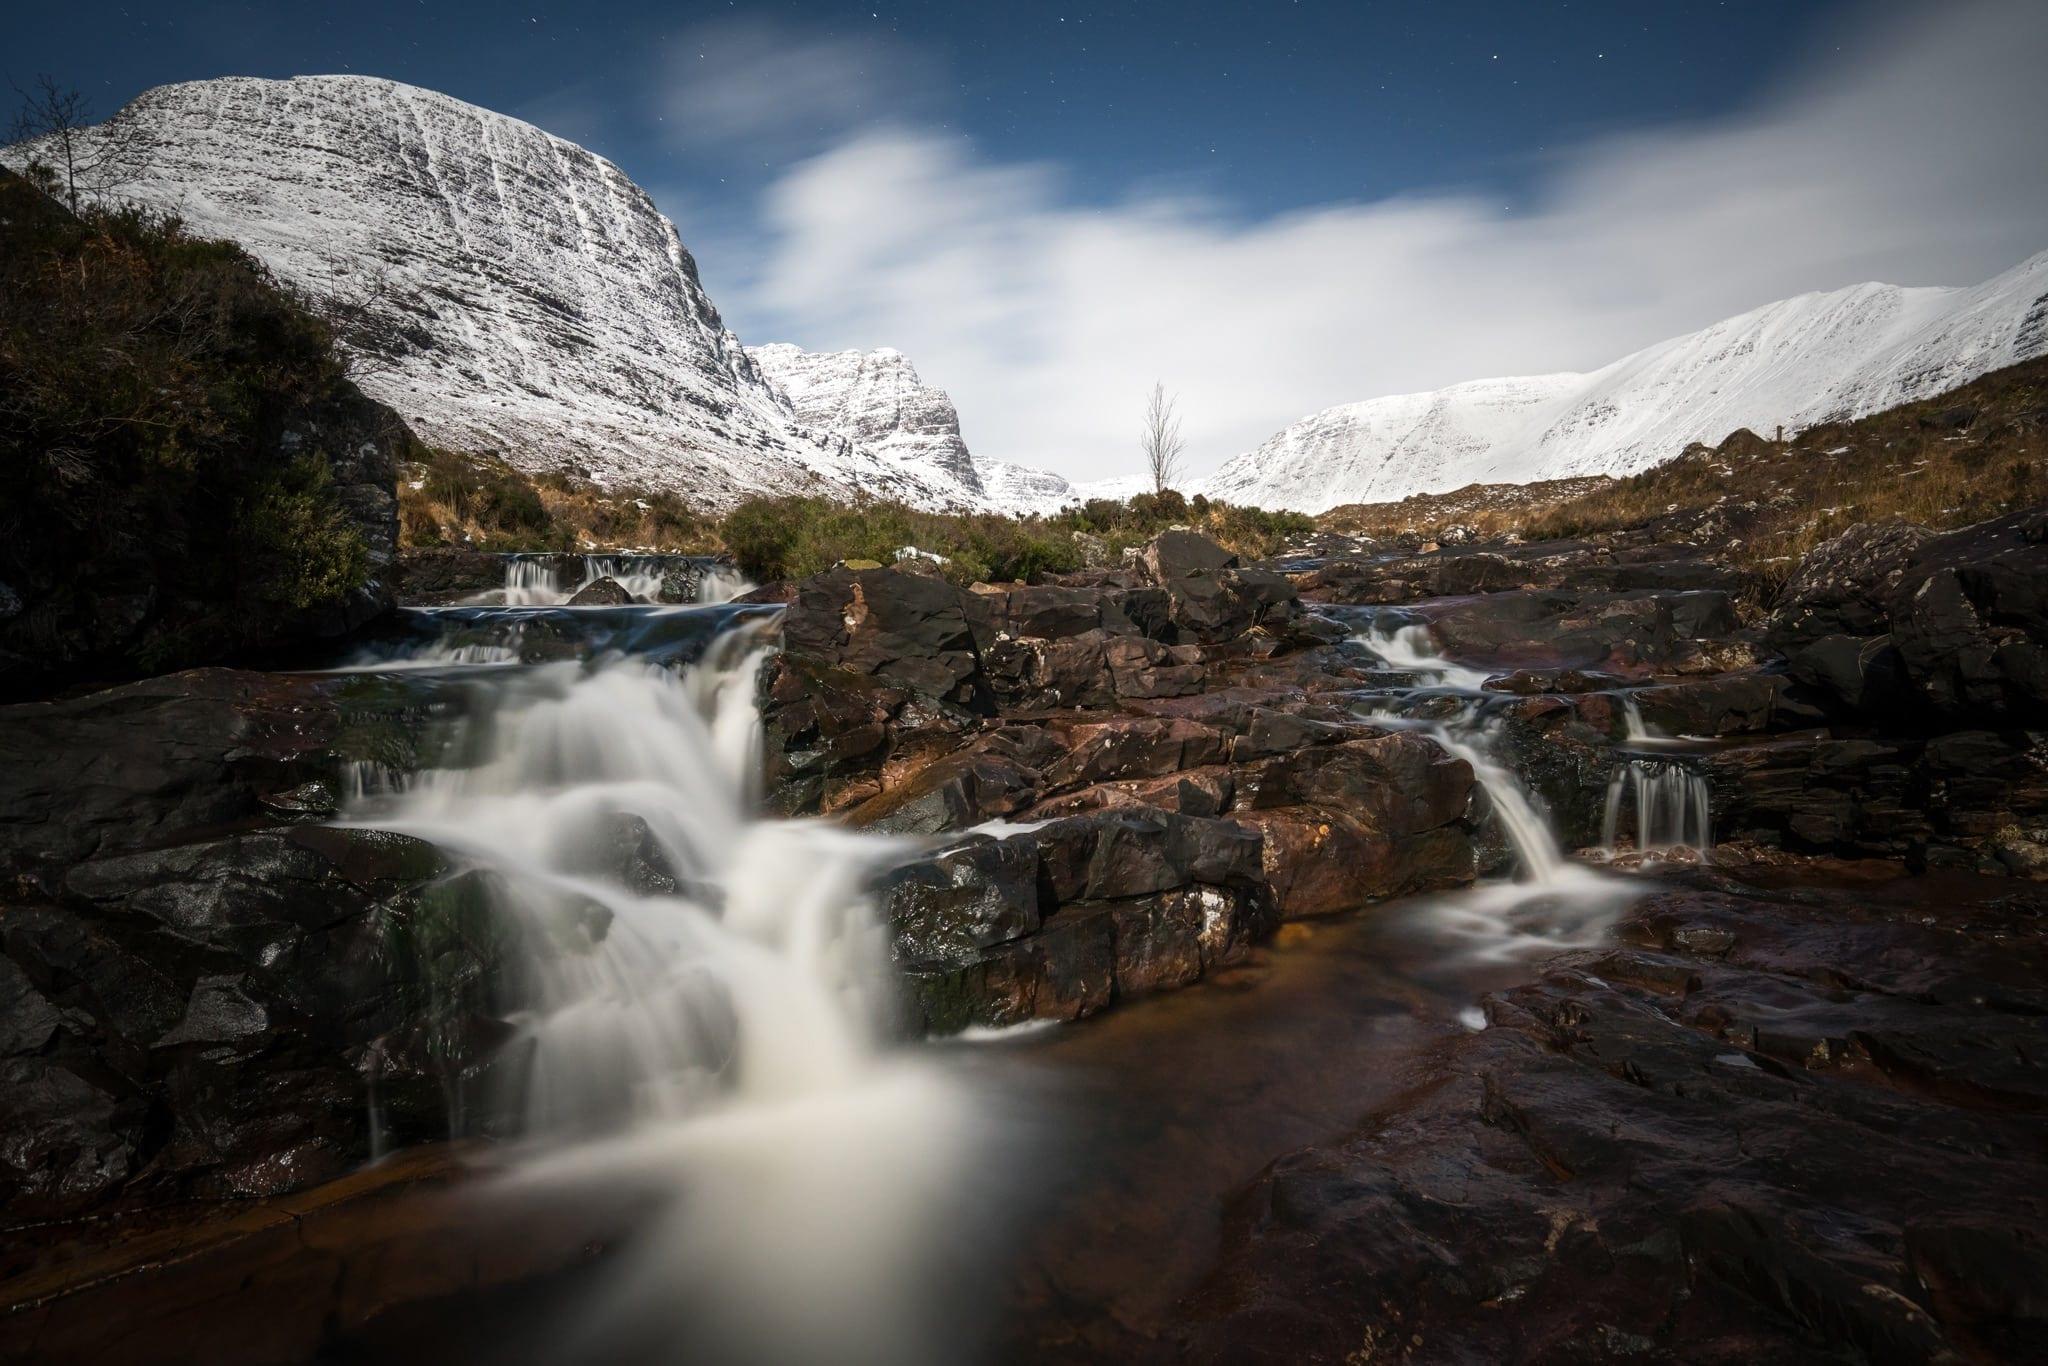 Russel Burn by Moonlight - Scotland Landscape Photography